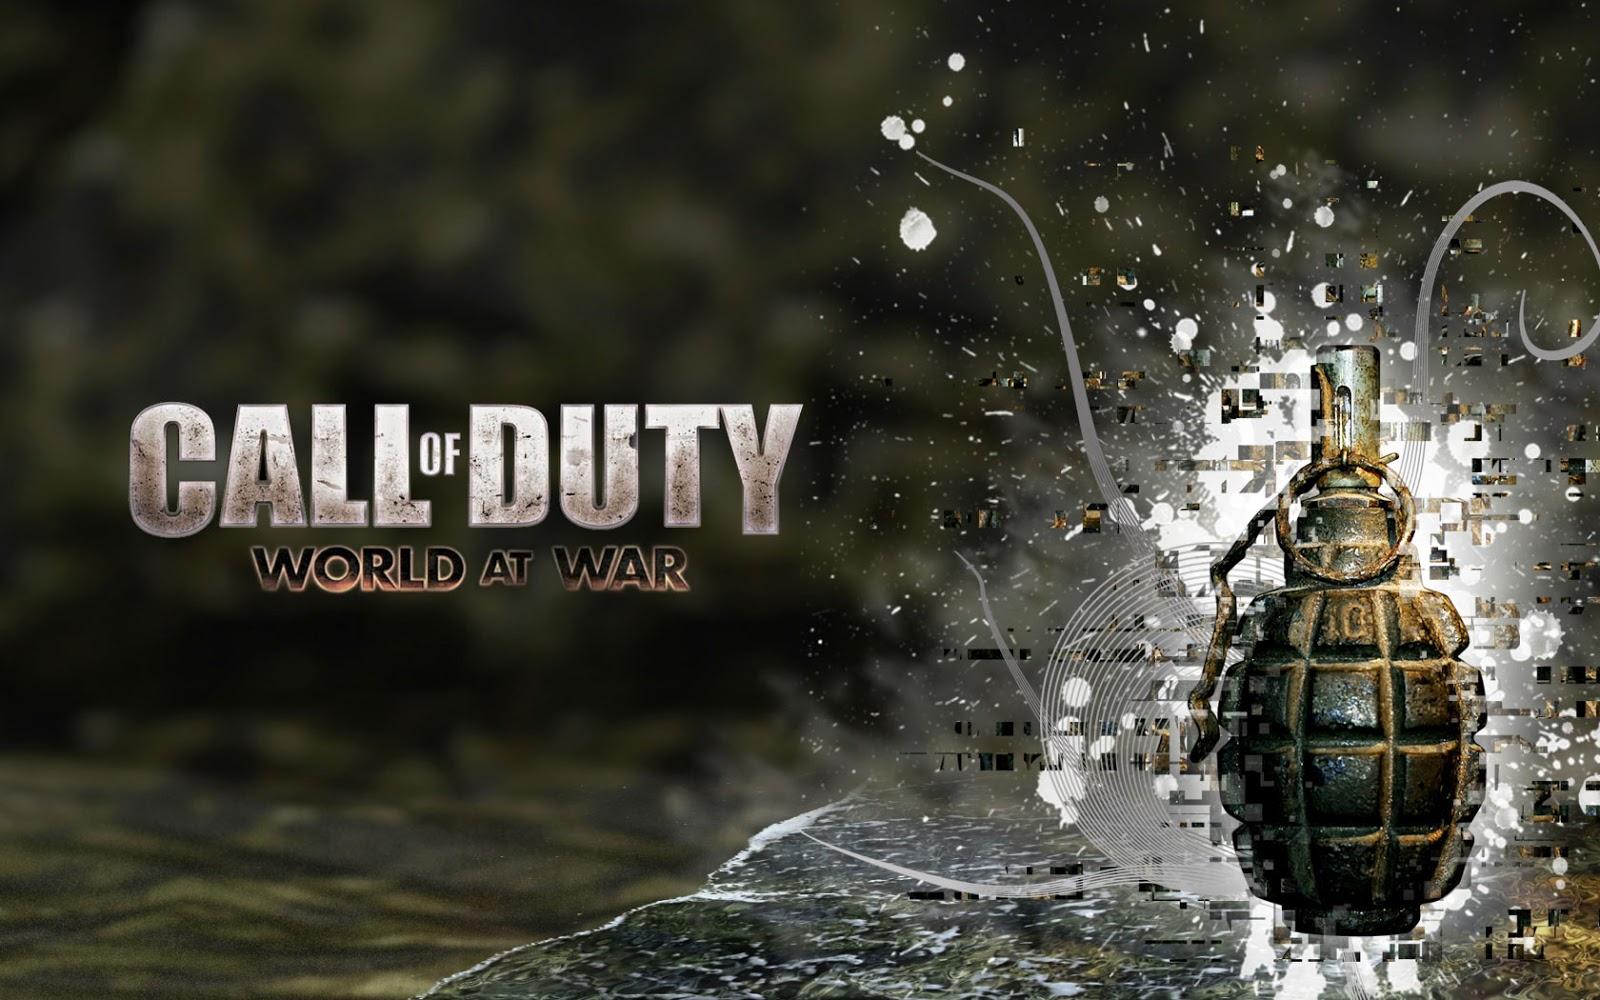 Call Of Duty Wallpaper Hd: HD WALLPAPERS: Call Of Duty 5 World At War